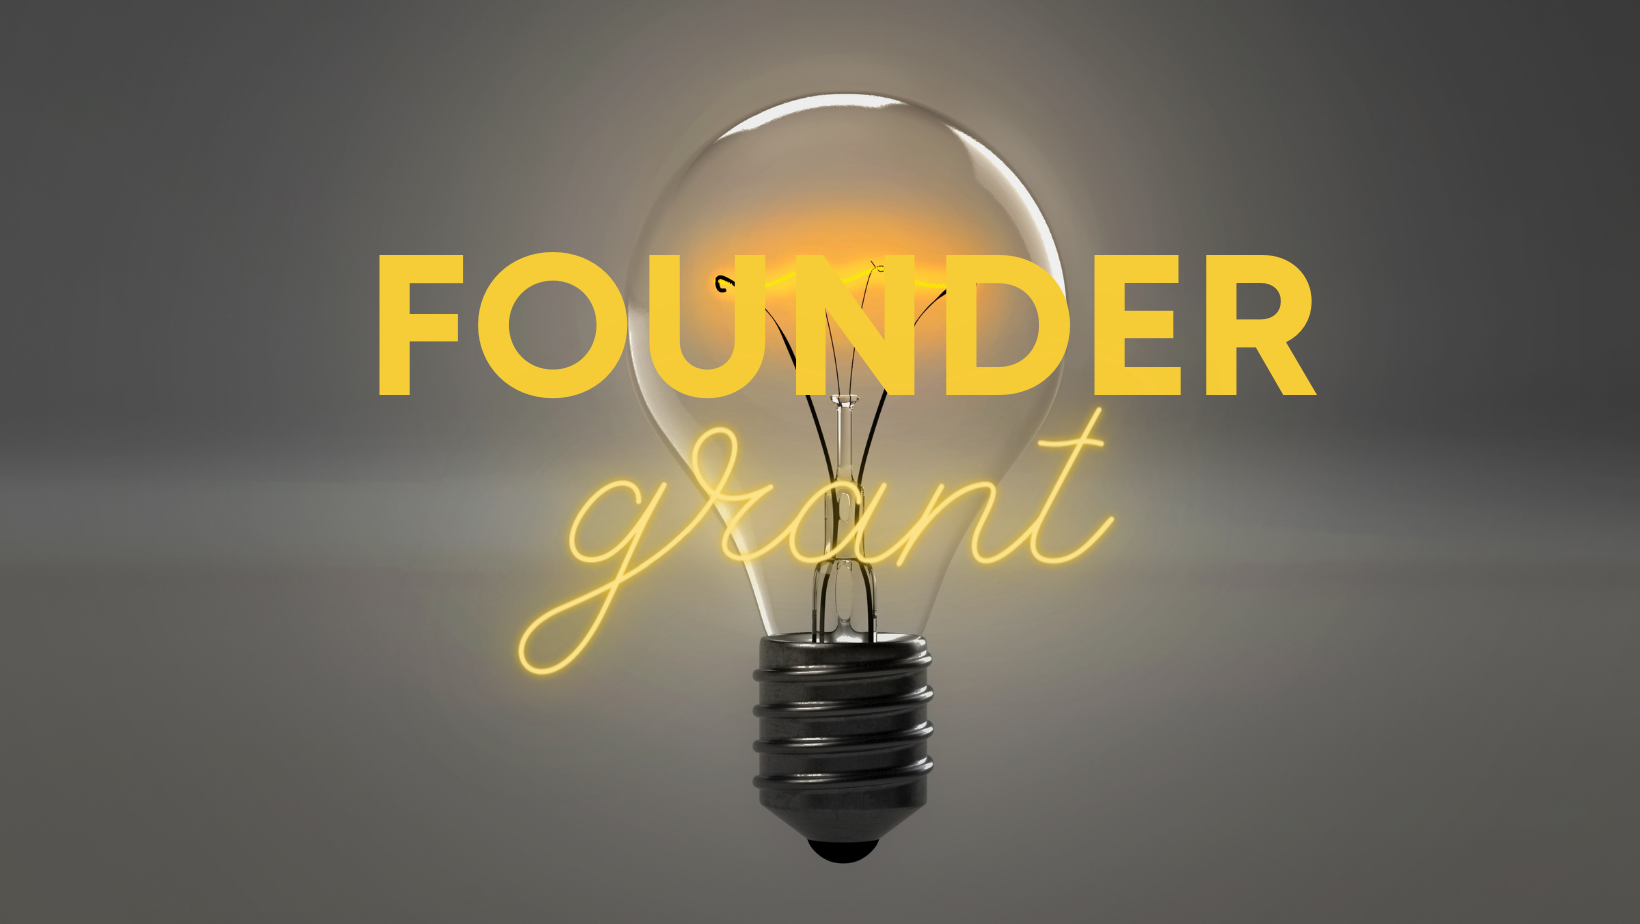 Founder Grant